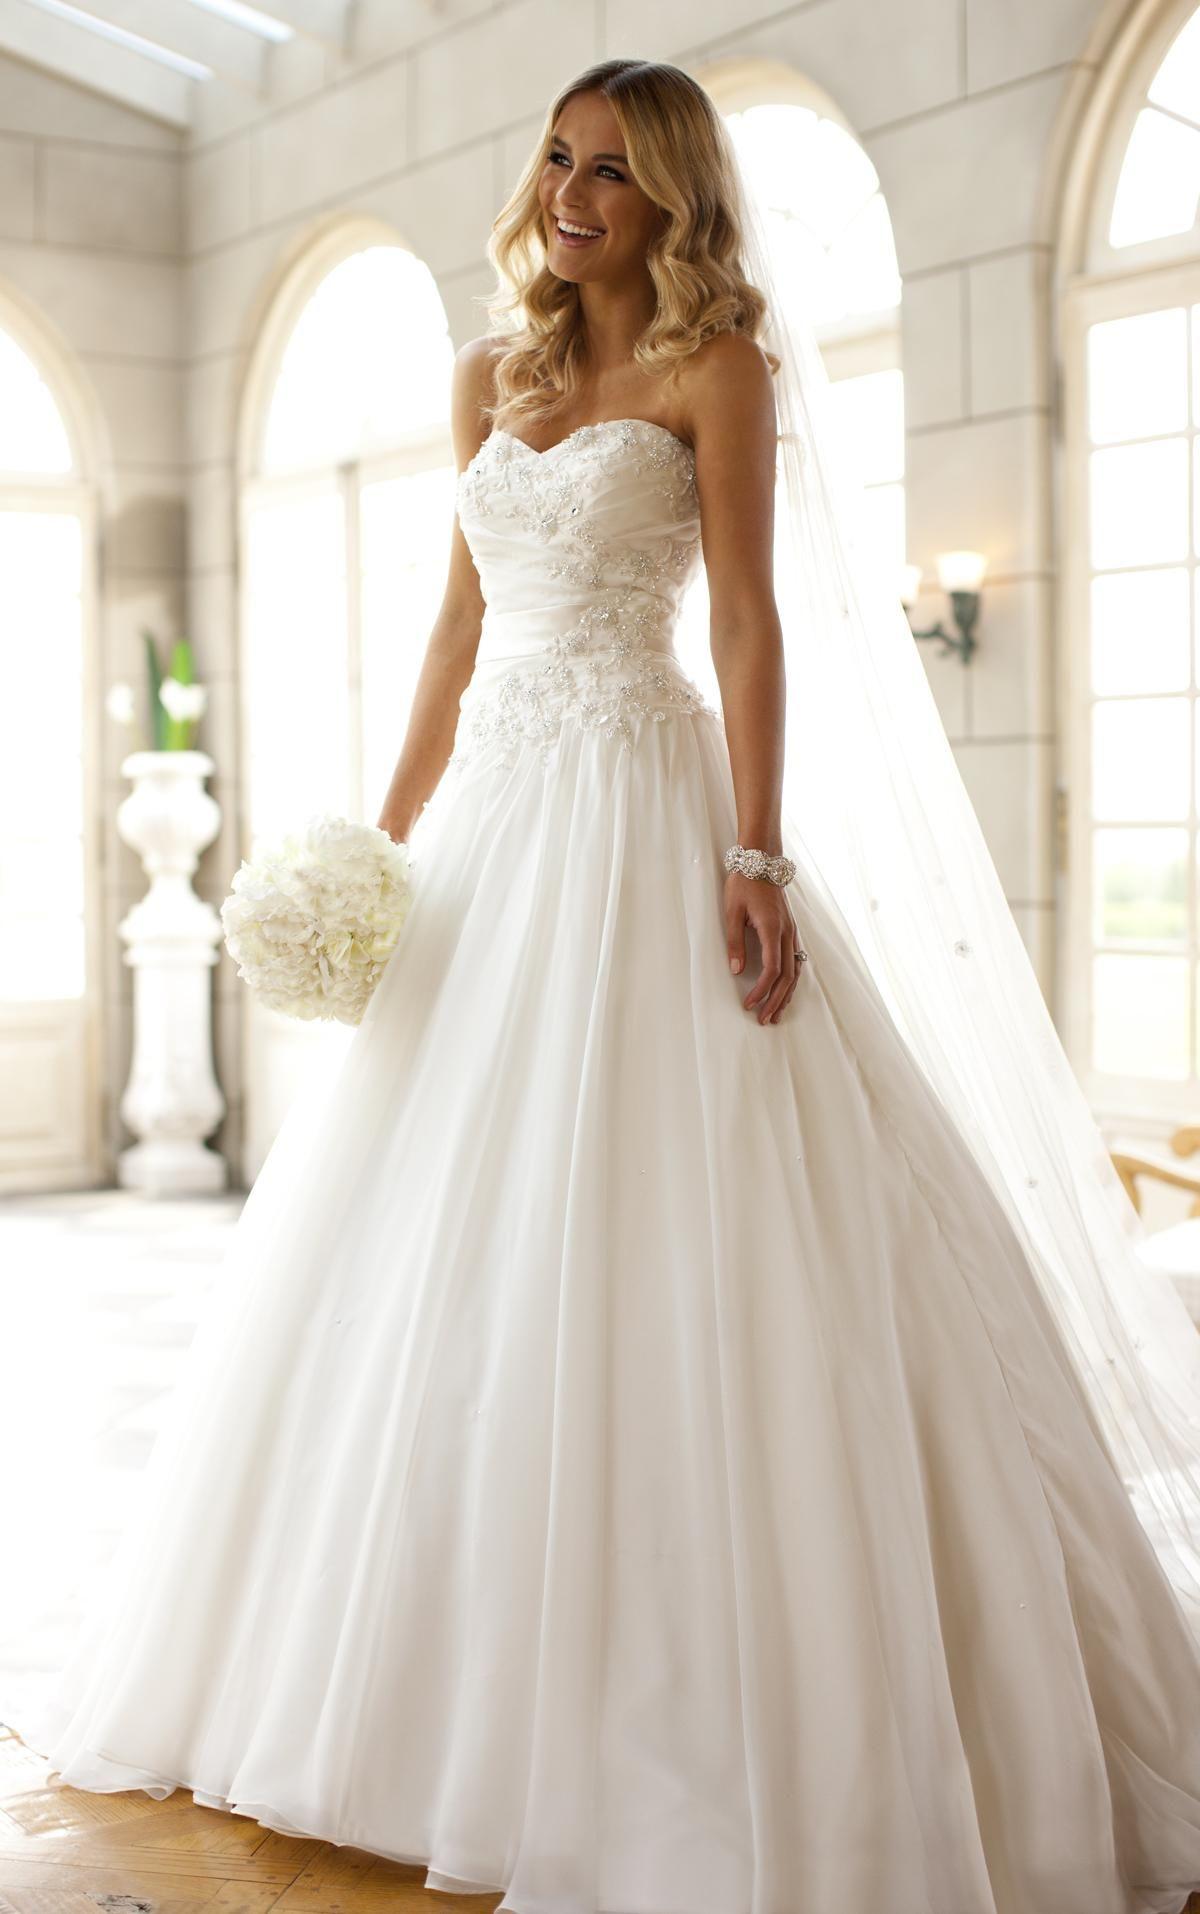 Abiti Da Sposa Prezzi.Abiti Da Sposa Firenze Prezzi Bassi Wedding Dresses